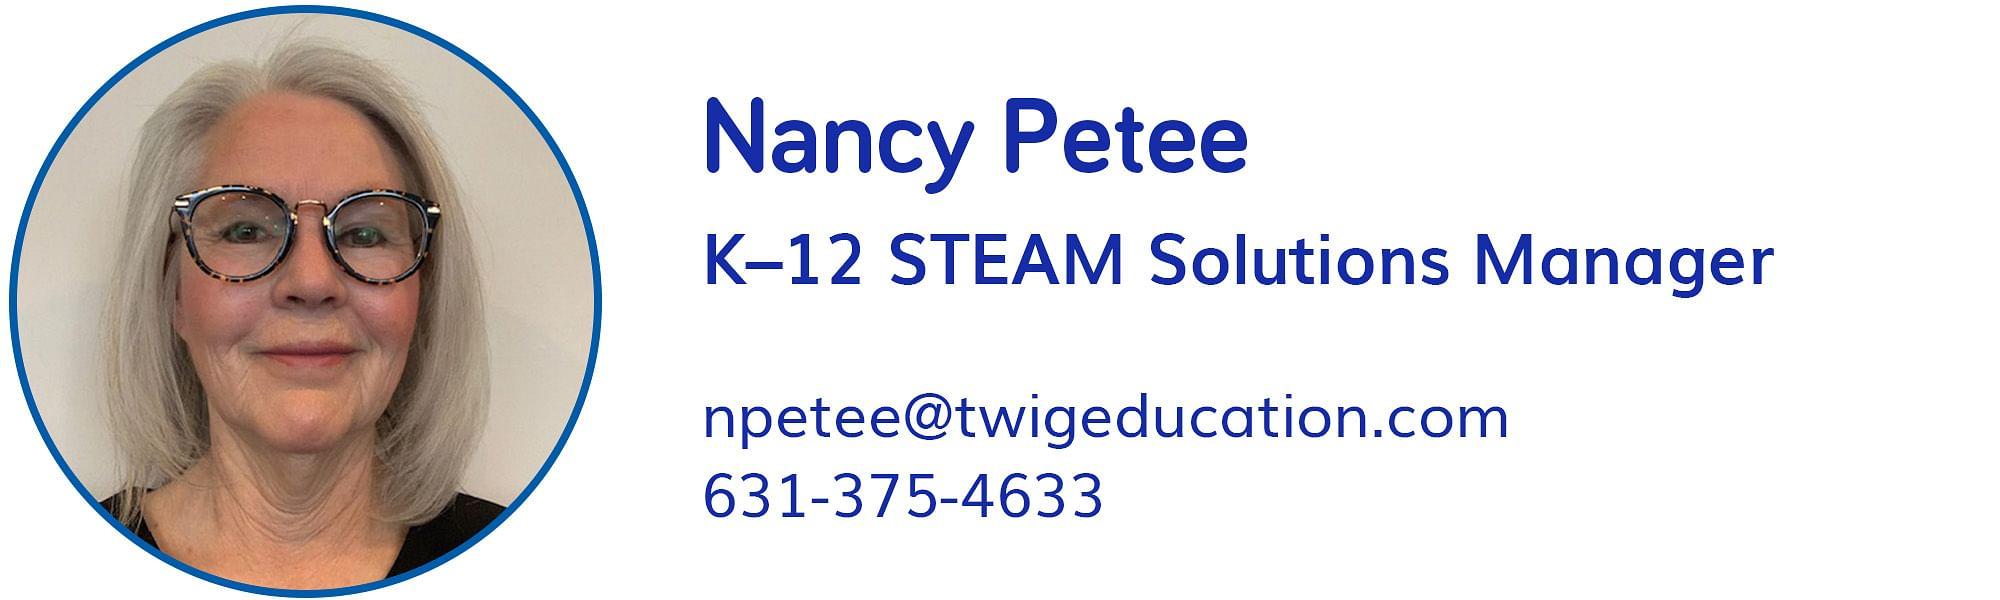 Nancy Petee, npetee@twigeducation.com, 631-375-4633